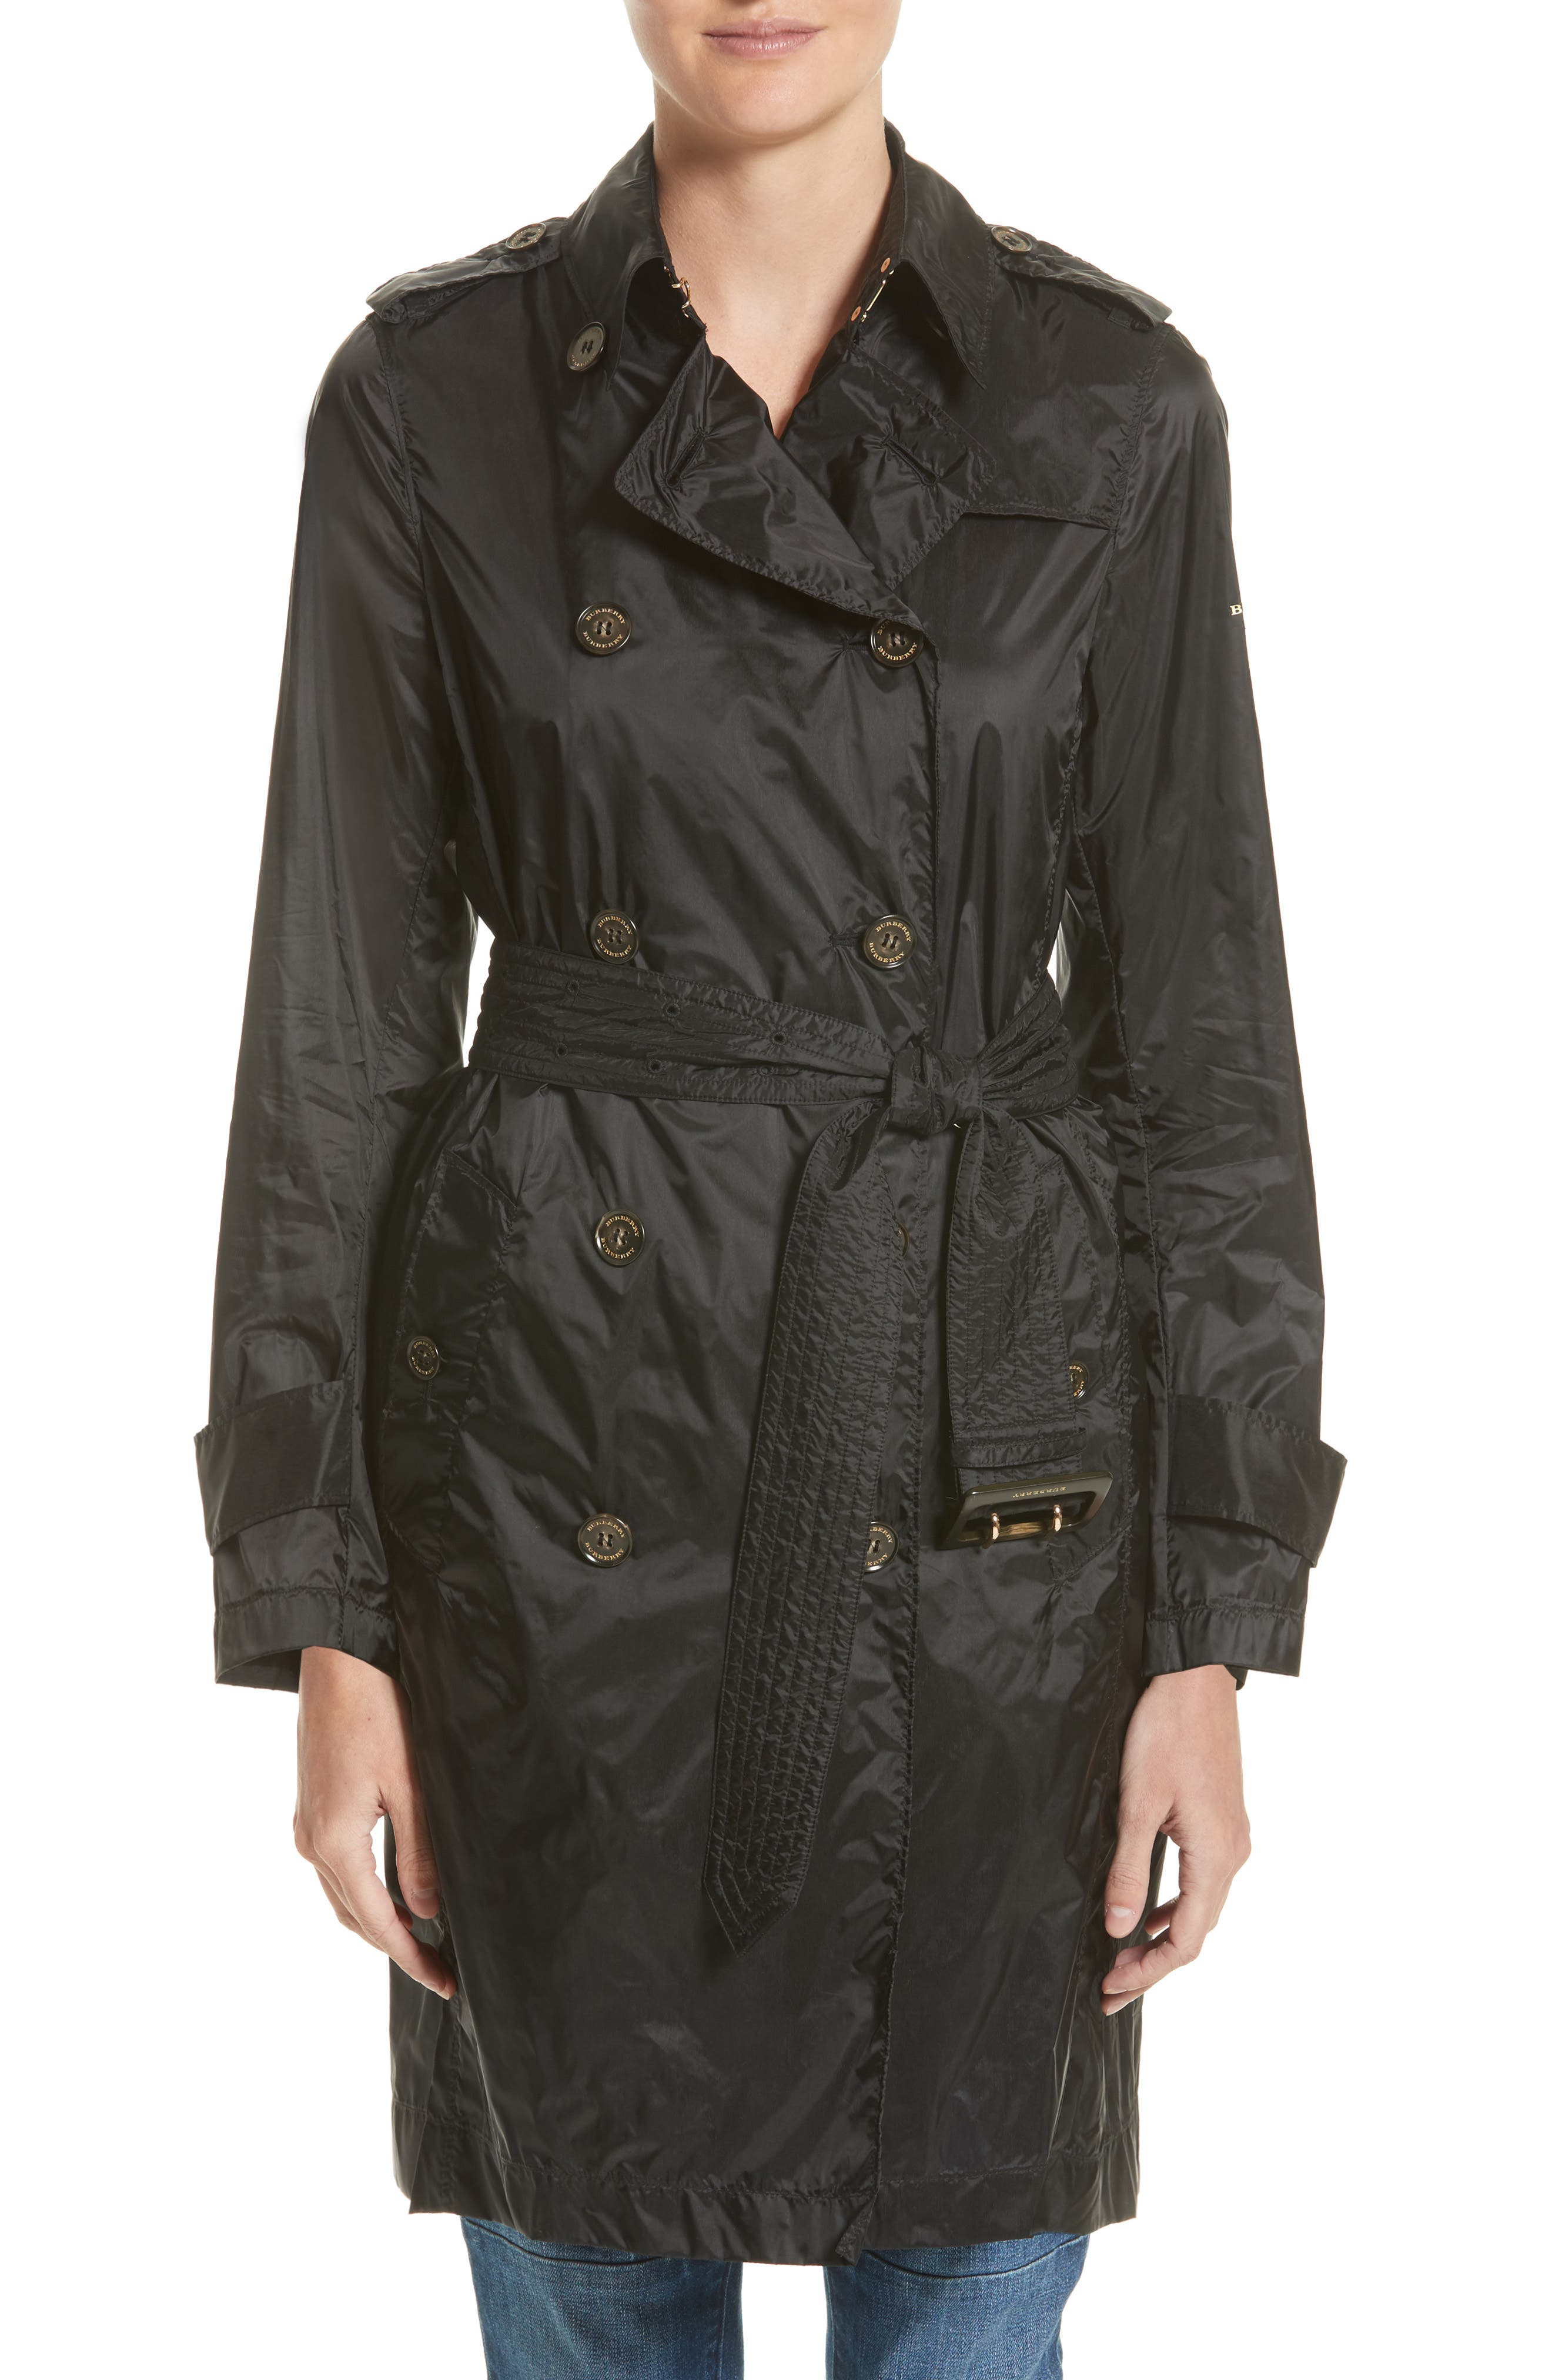 Kenwick Trench Coat,                         Main,                         color, 001